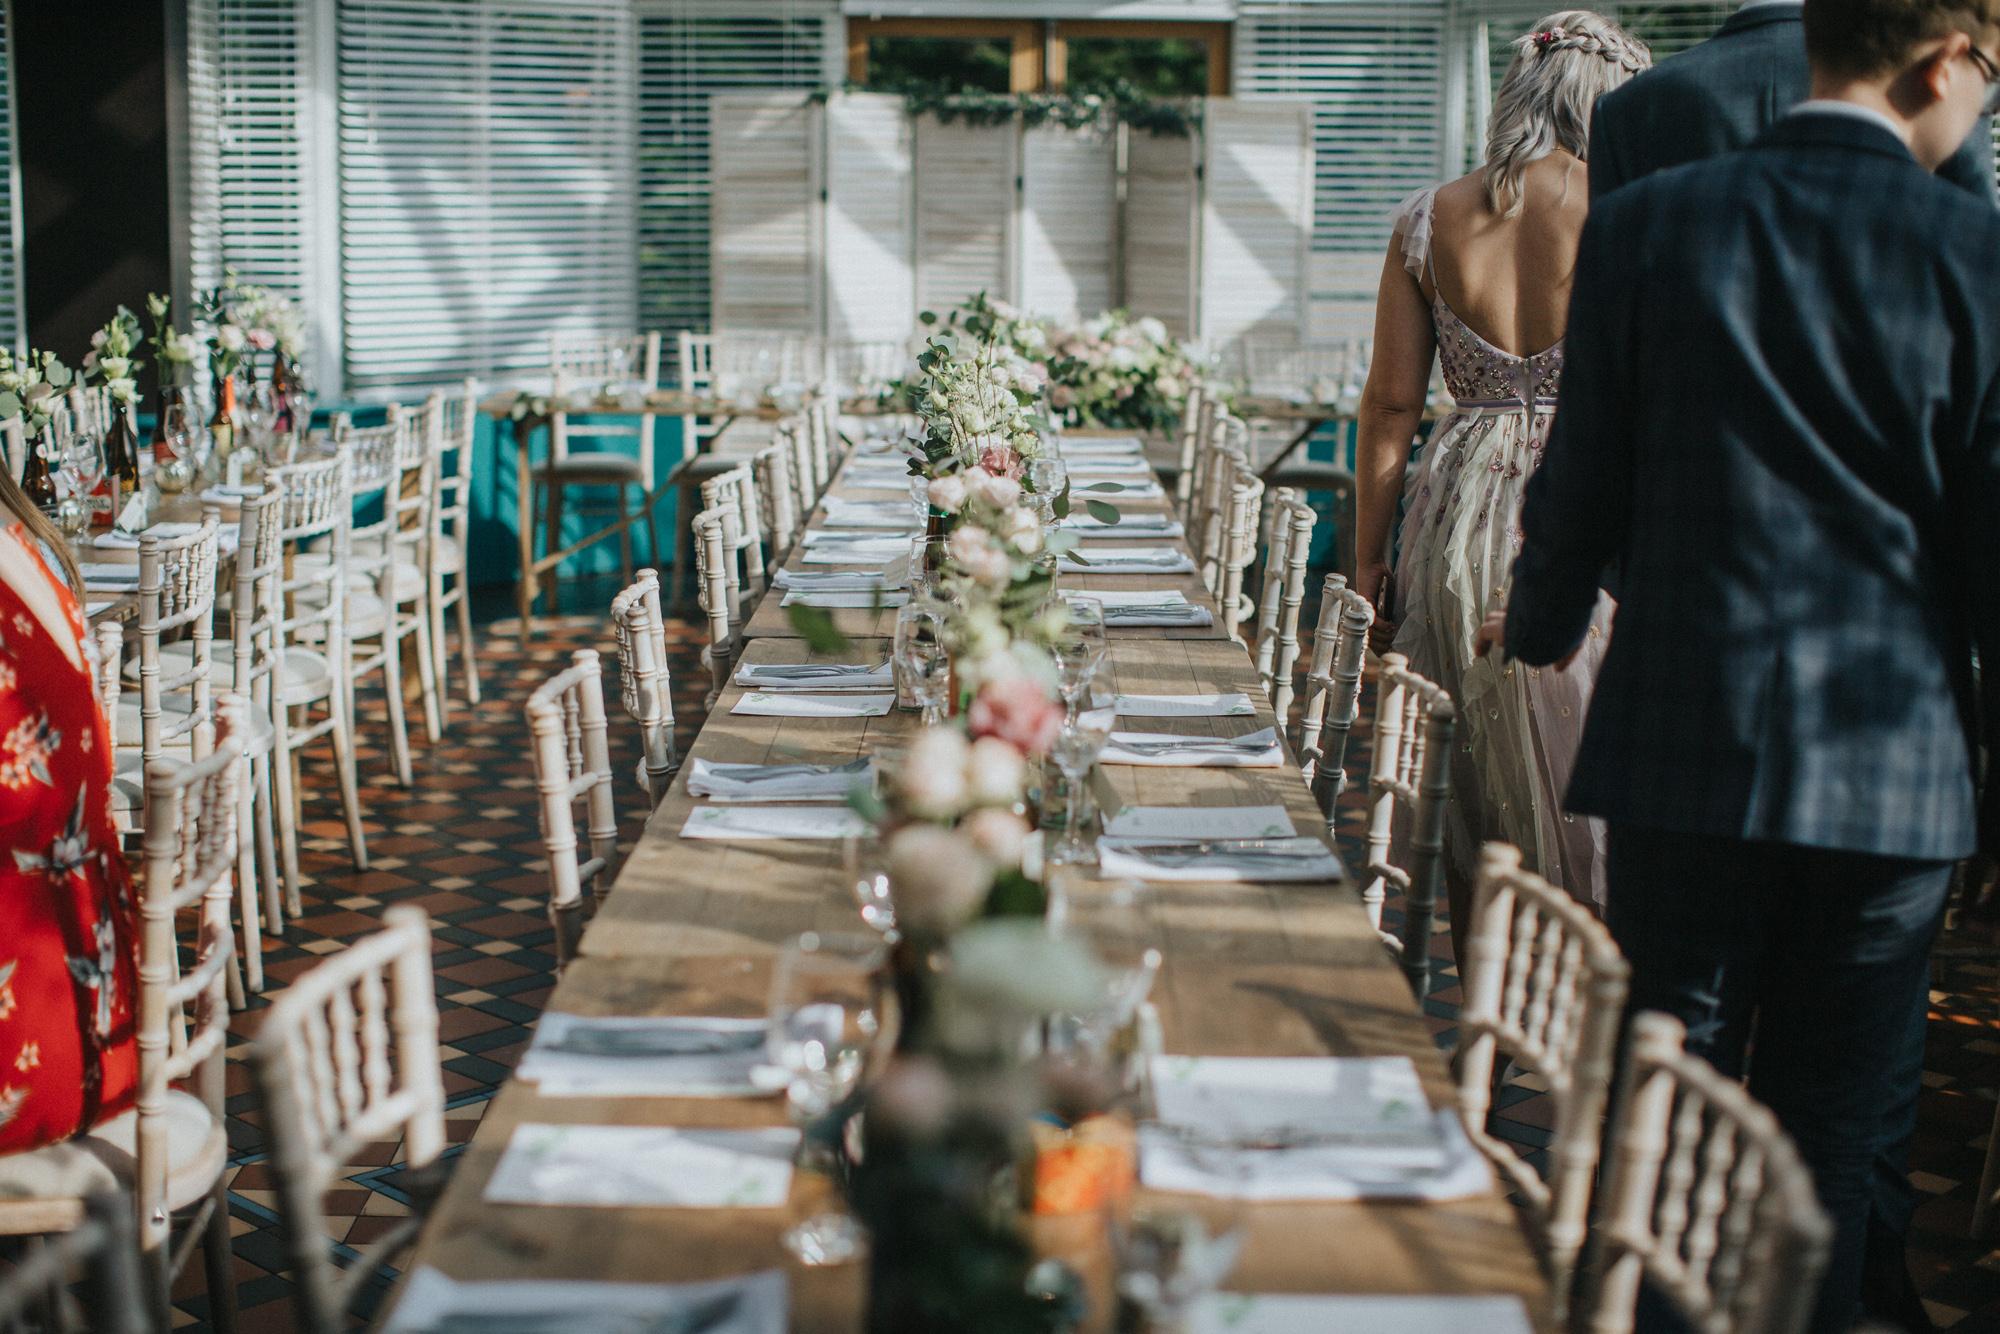 Kate-Beaumont-Lace-Flared-Dahlia-Gown-Leeds-Wedding-Bloom-Weddings-45.jpg